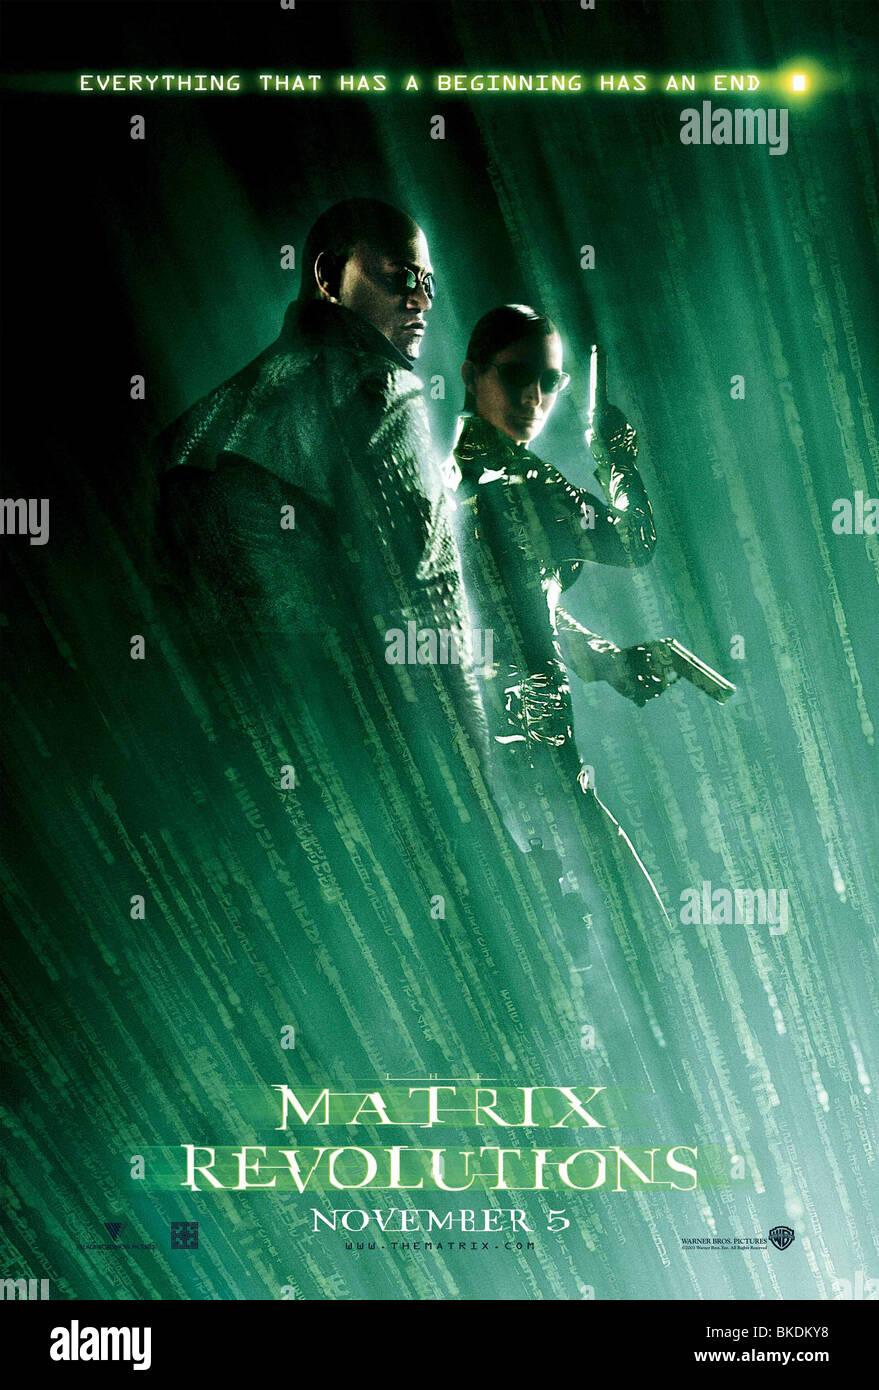 THE MATRIX REVOLUTIONS (2003) THE MATRIX 3 (ALT) POSTER MTX3 002-P4 - Stock Image